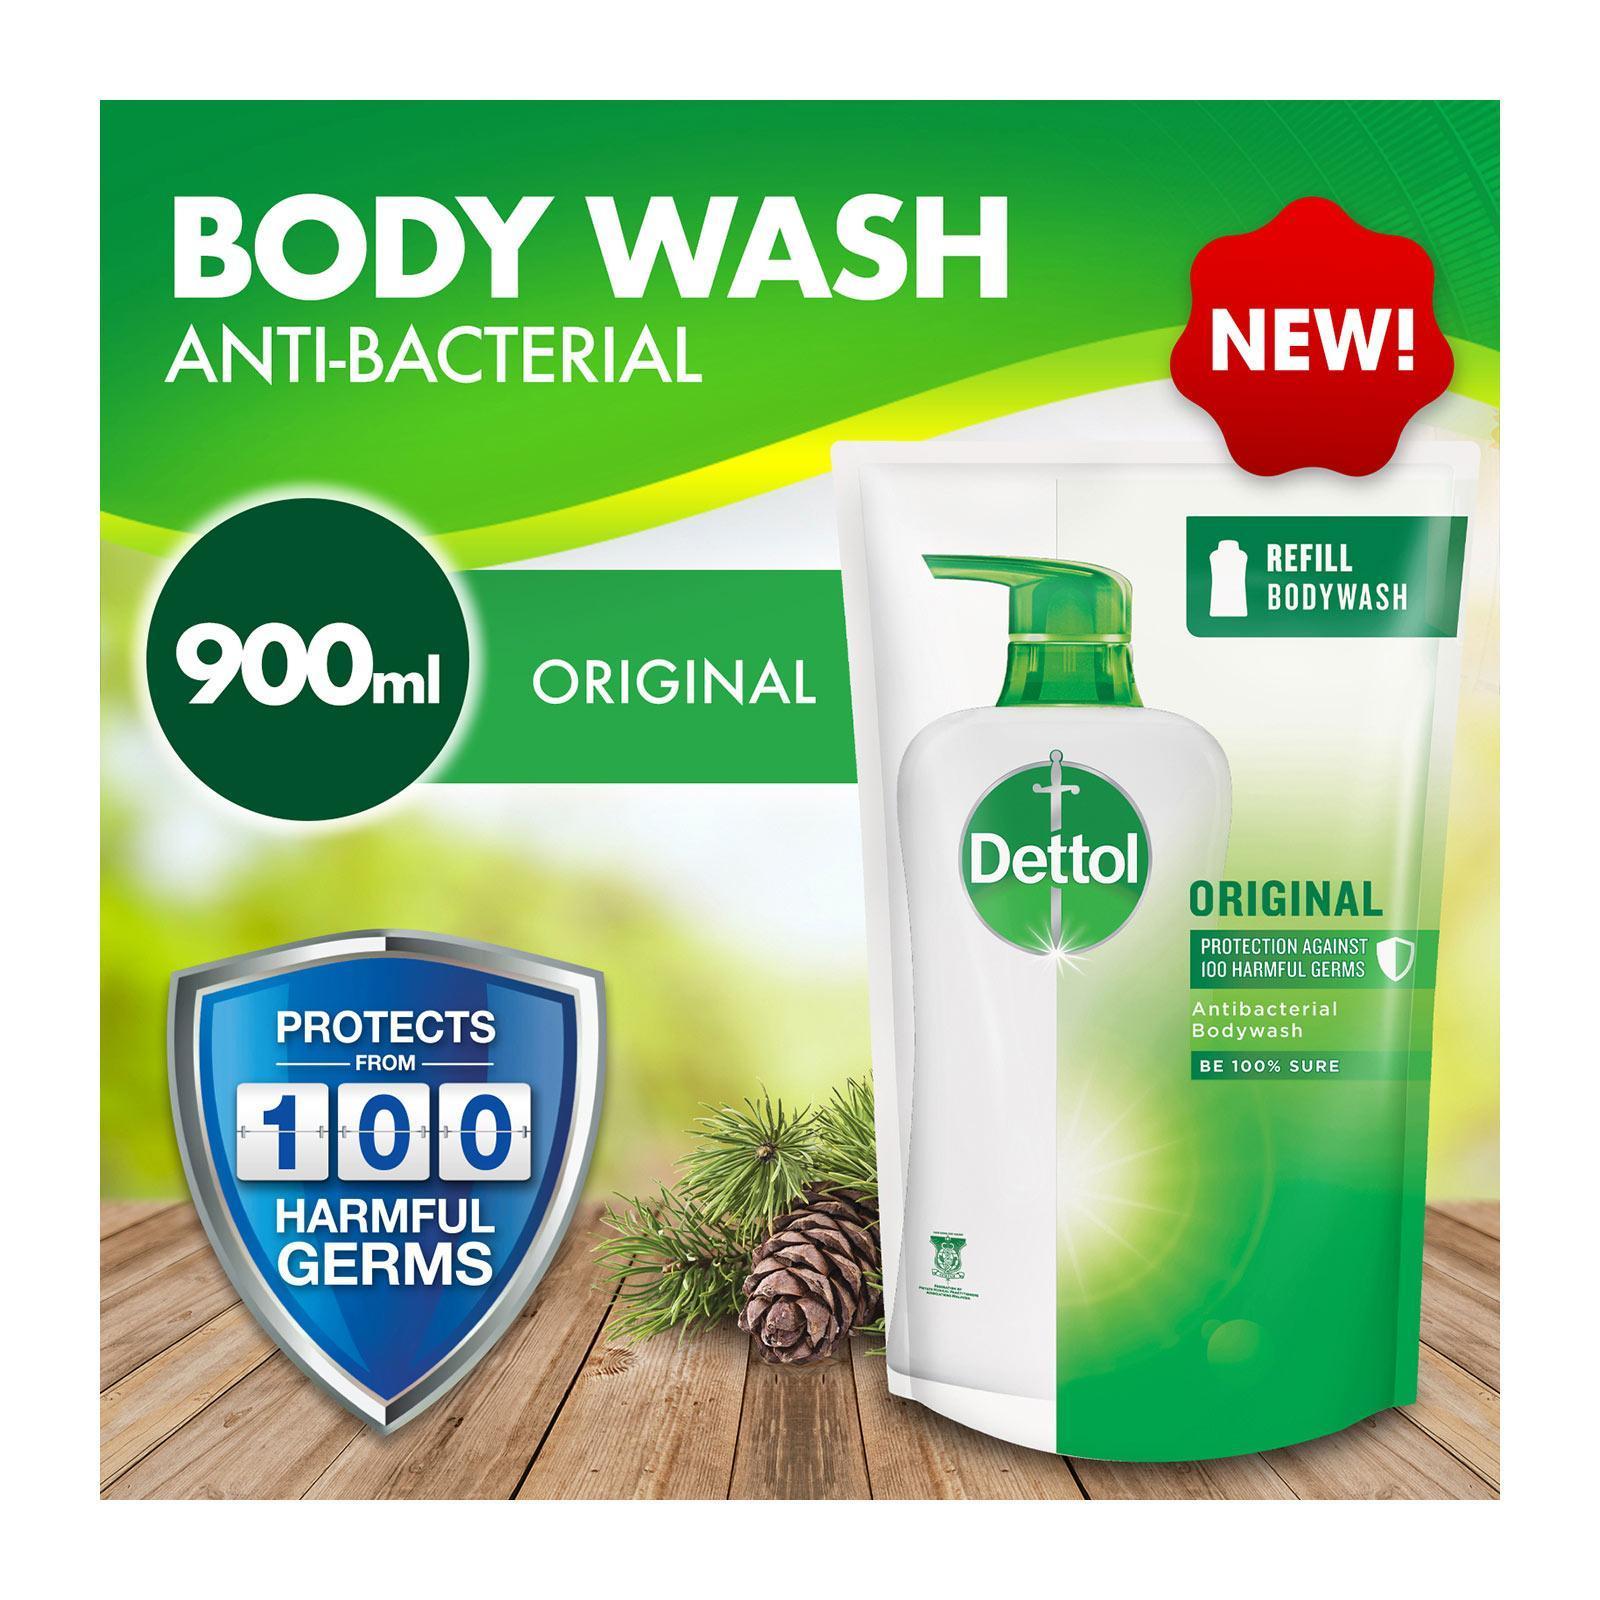 Dettol Anti-Bacterial pH-Balanced Body Wash Refill - Skincare